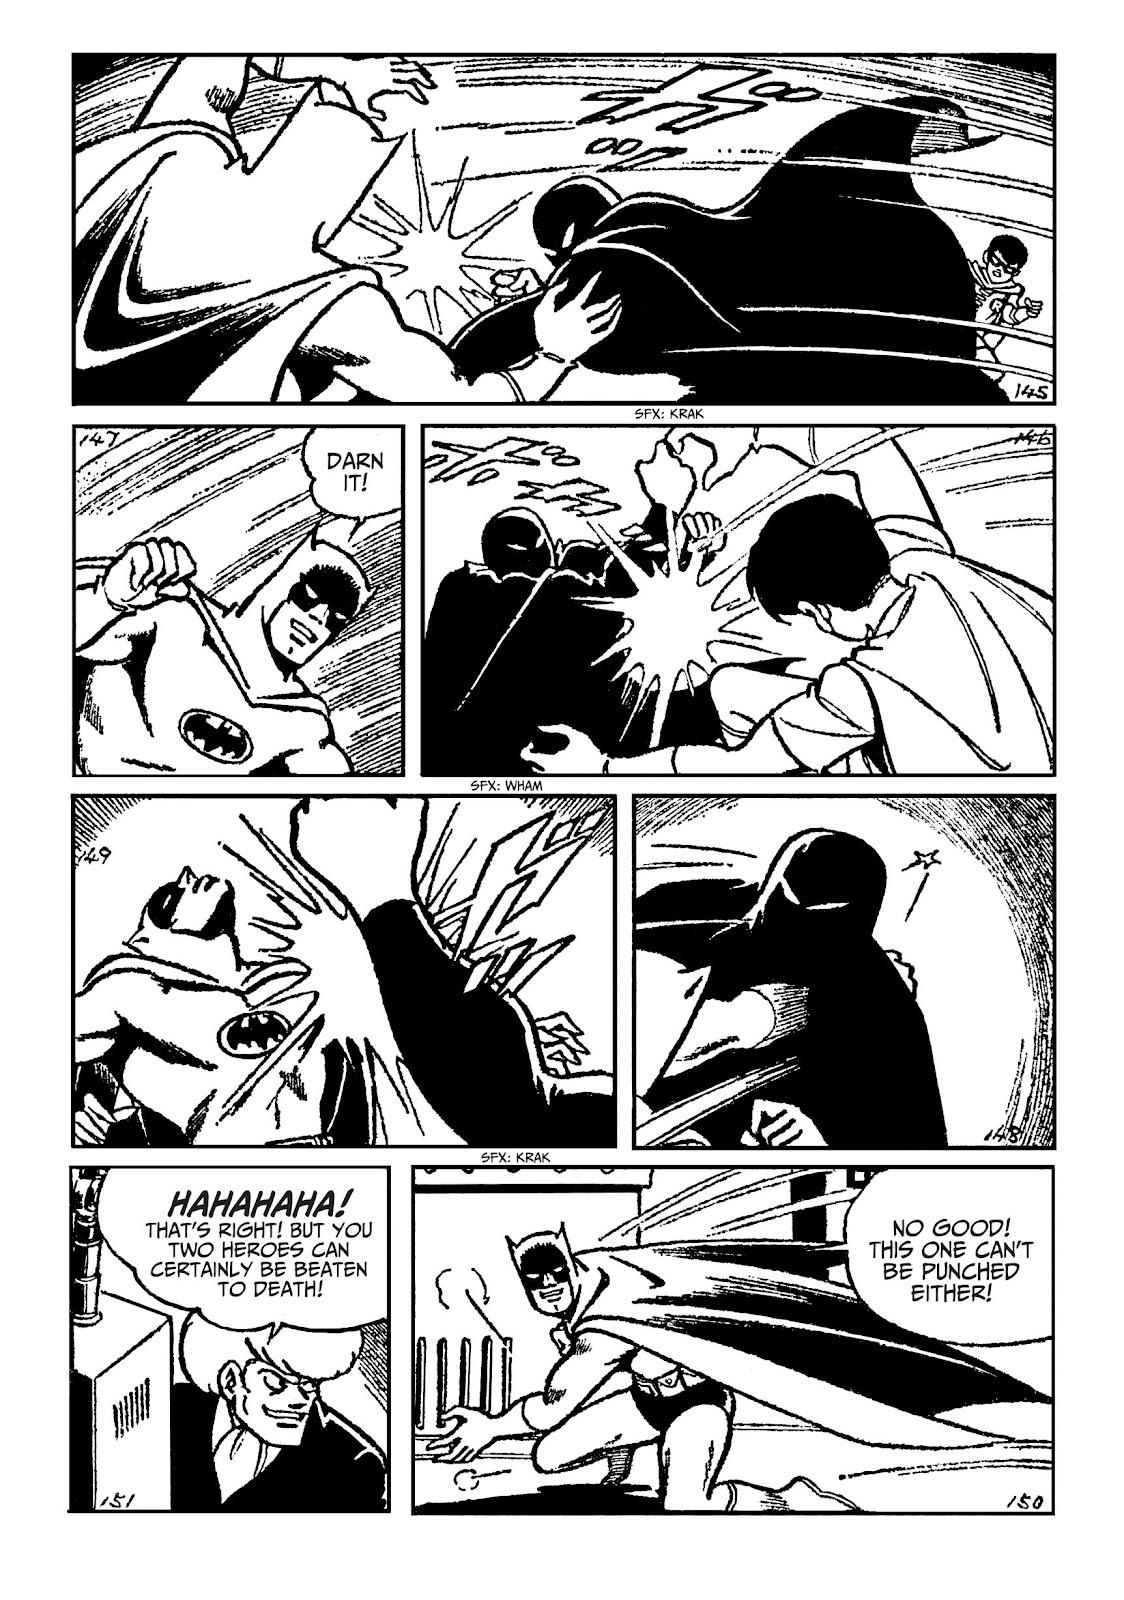 Read online Batman - The Jiro Kuwata Batmanga comic -  Issue #51 - 25